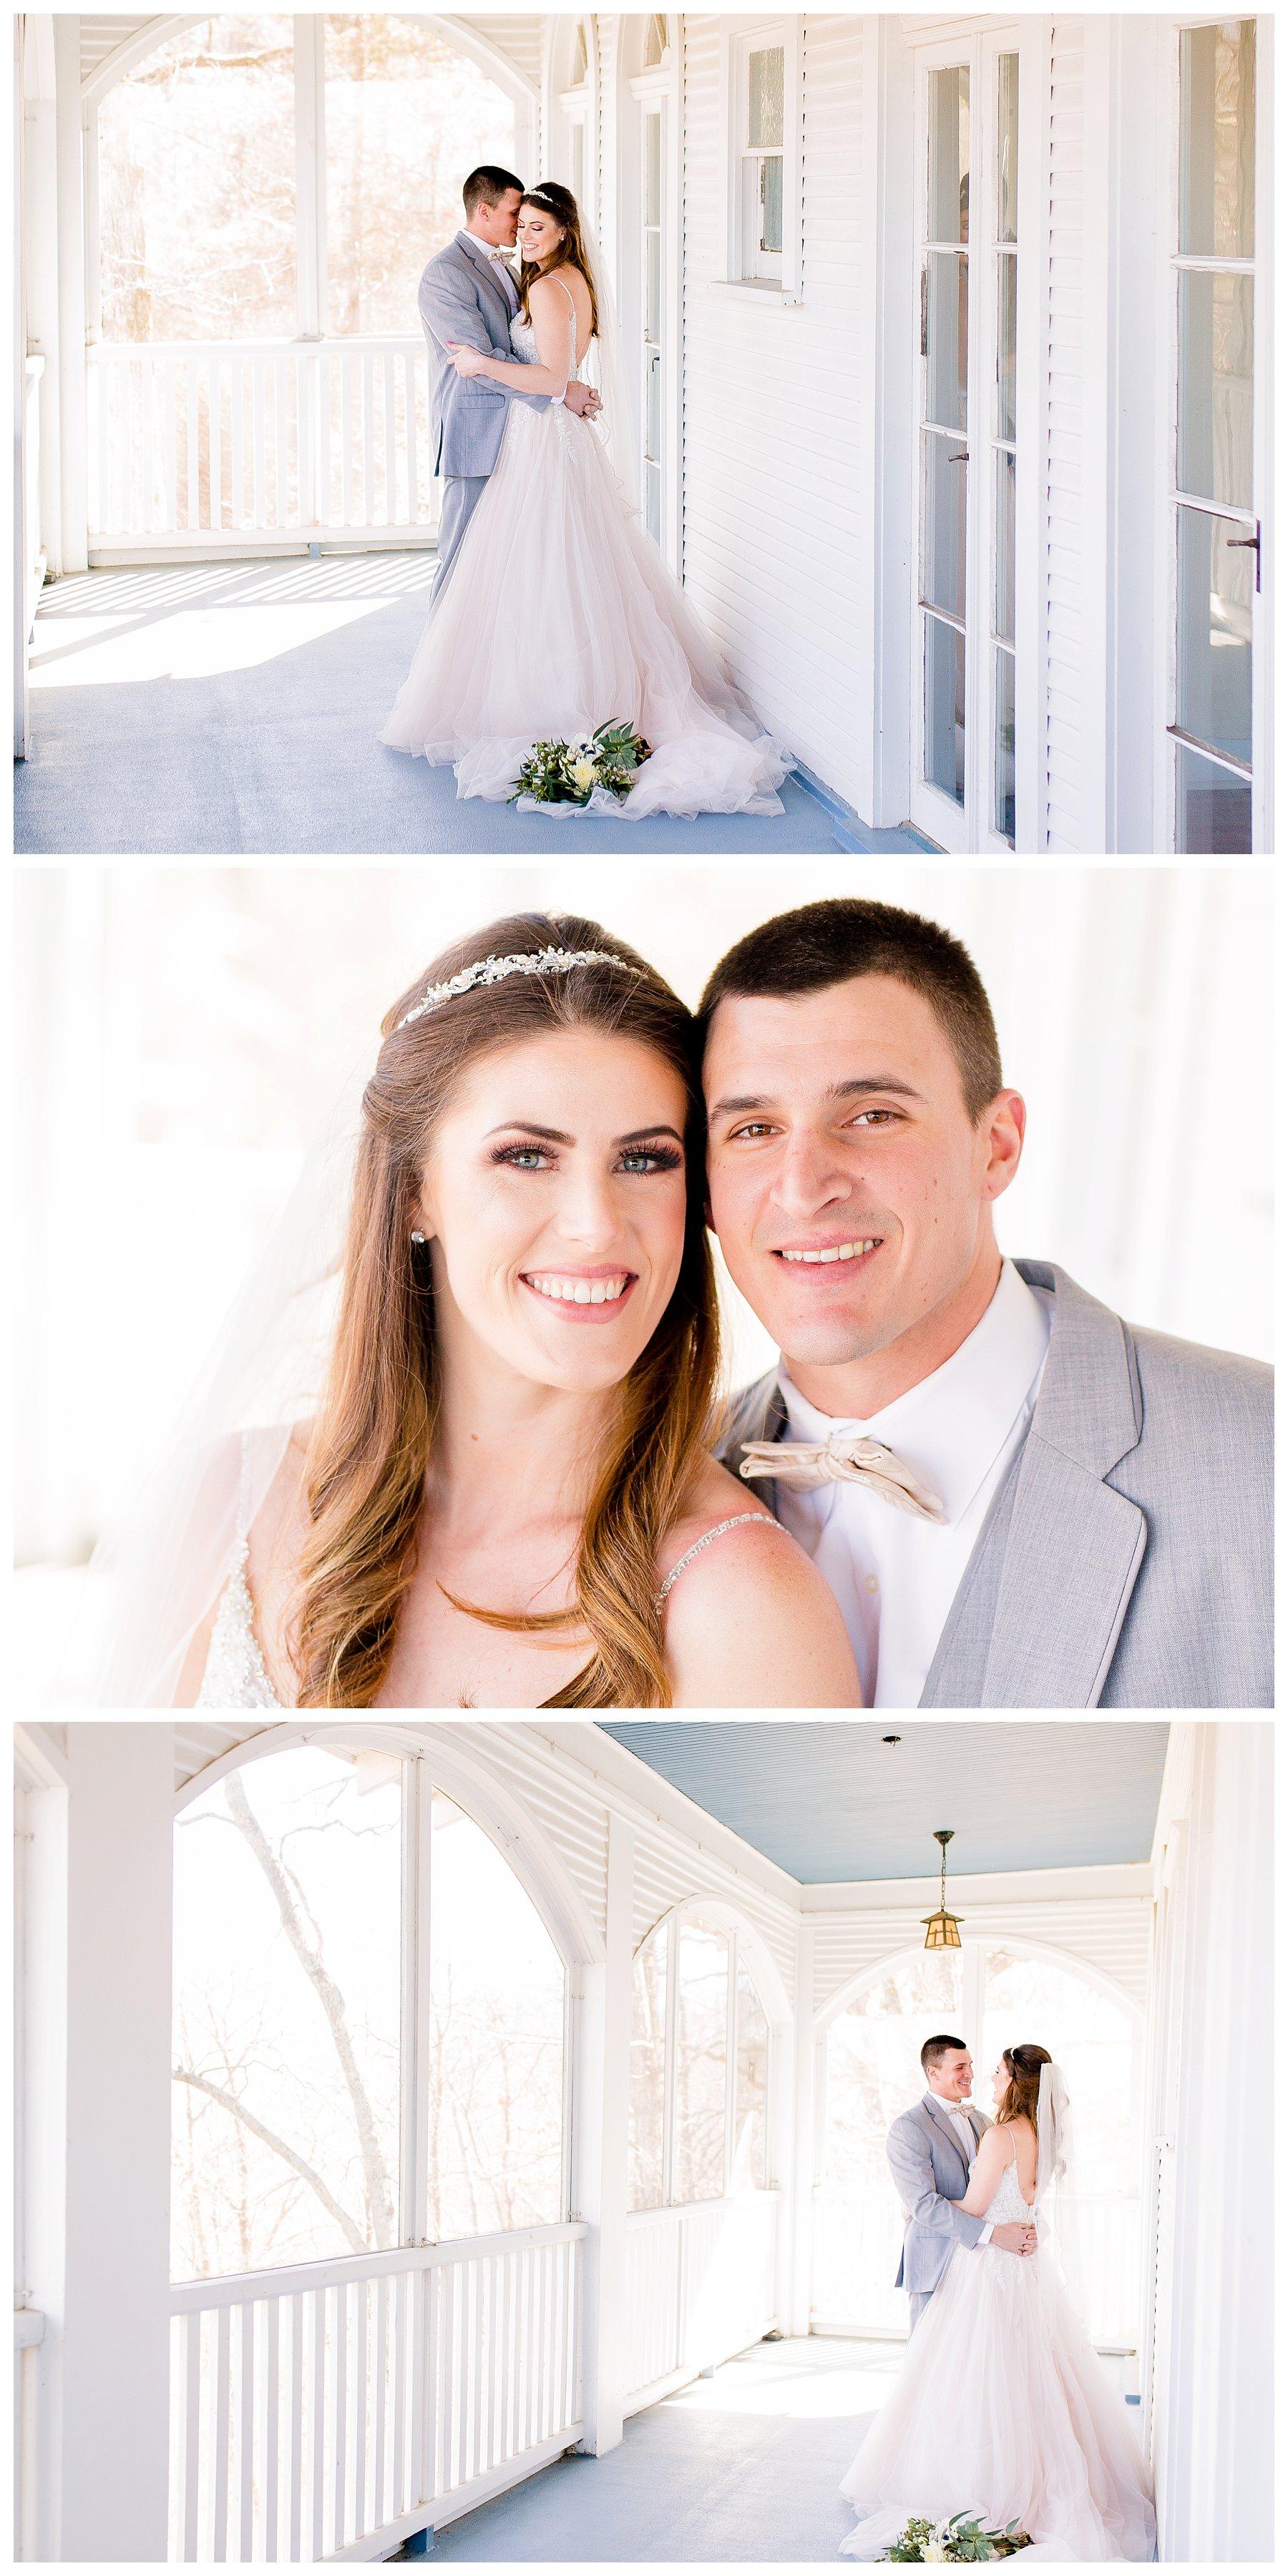 photographer_wedding_saint_louis_Kansas_City_Photography_Videography_workshop_training_styled_engagement_Lake_Ozark_KC_MO_STL_Rolla_Hermann_Saint_James_0405.jpg